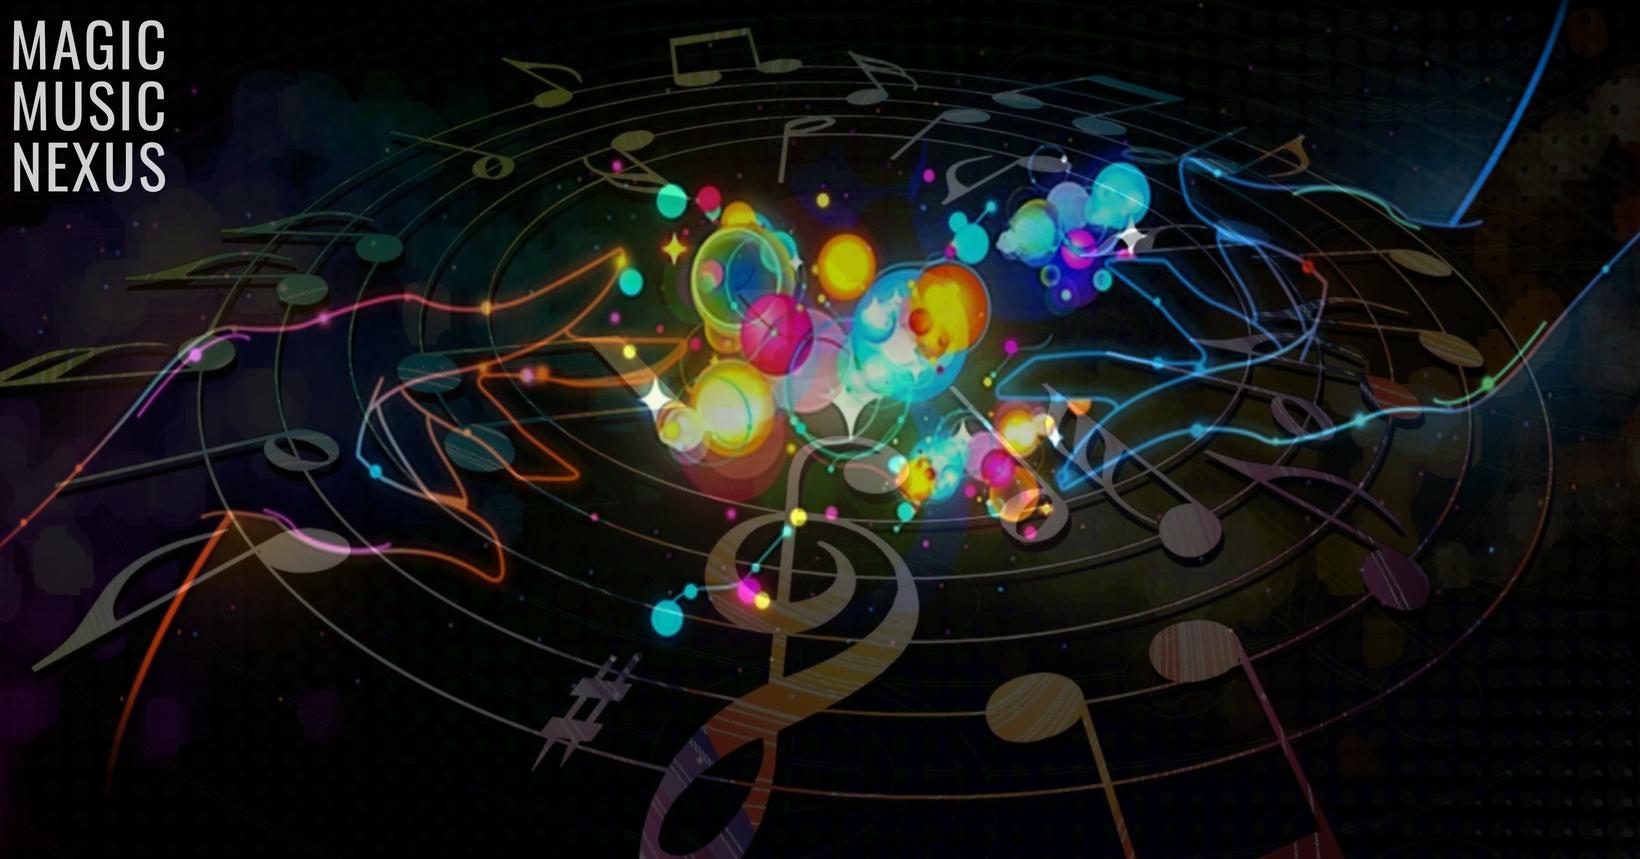 MagicMusicNexus.png